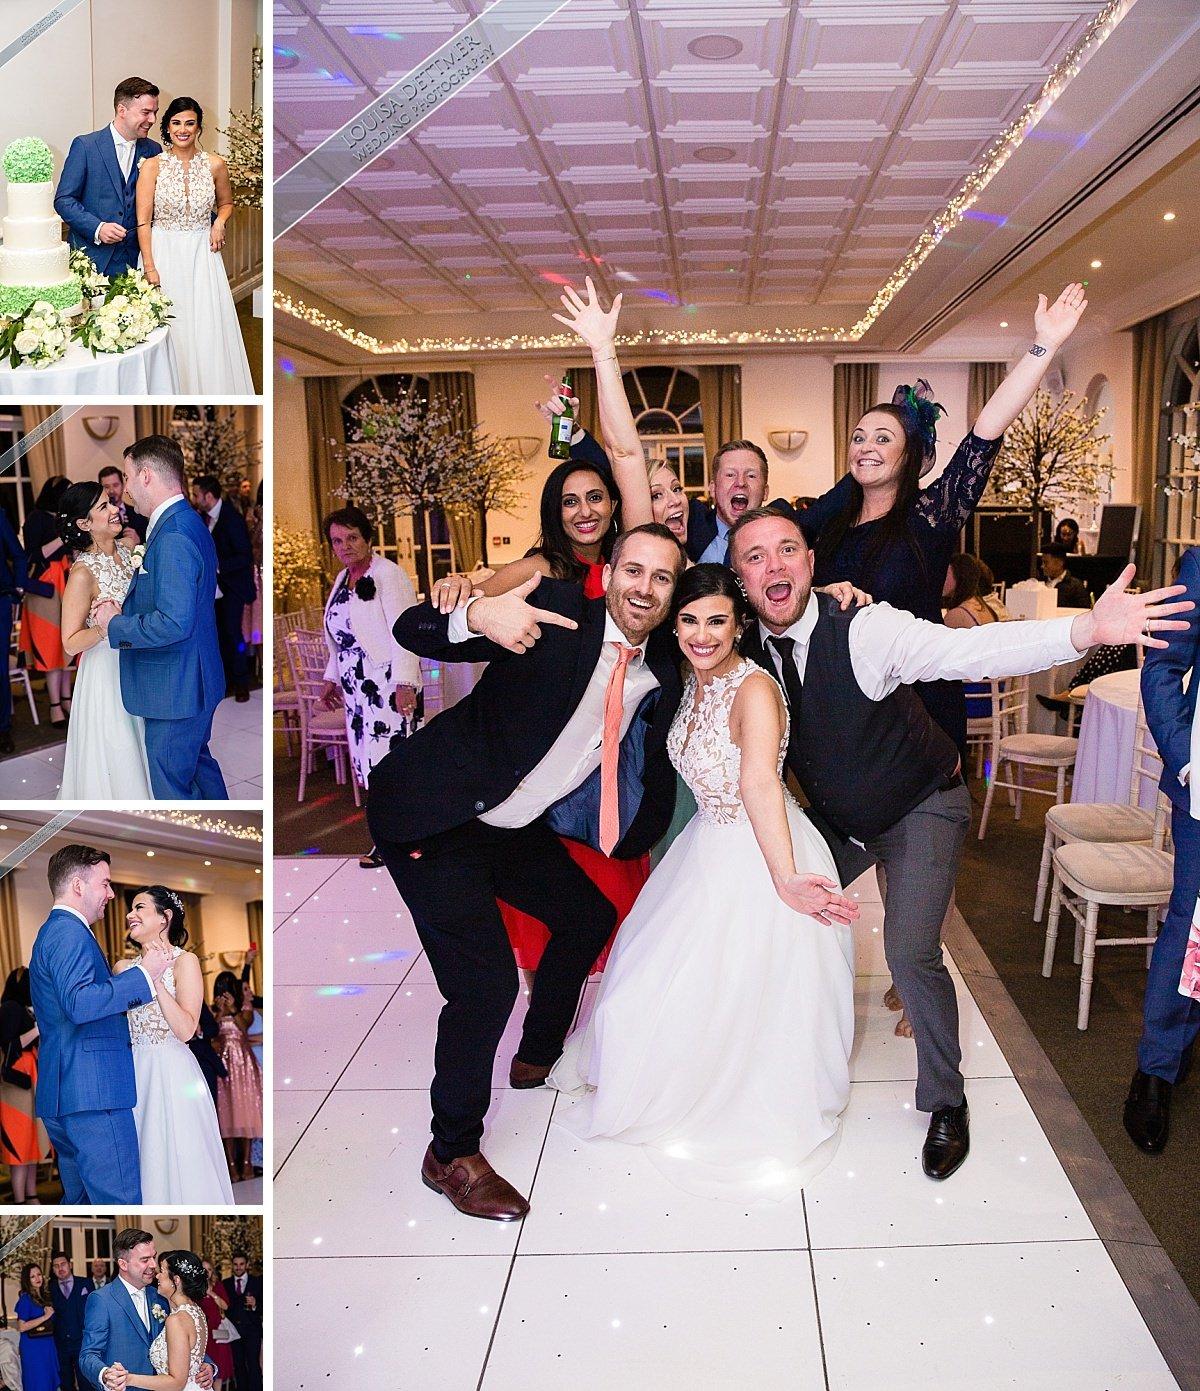 Wedding of Filomena & Richard, September 2019, The Orangery Maidstone, Louisa Dettmer Wedding Photography